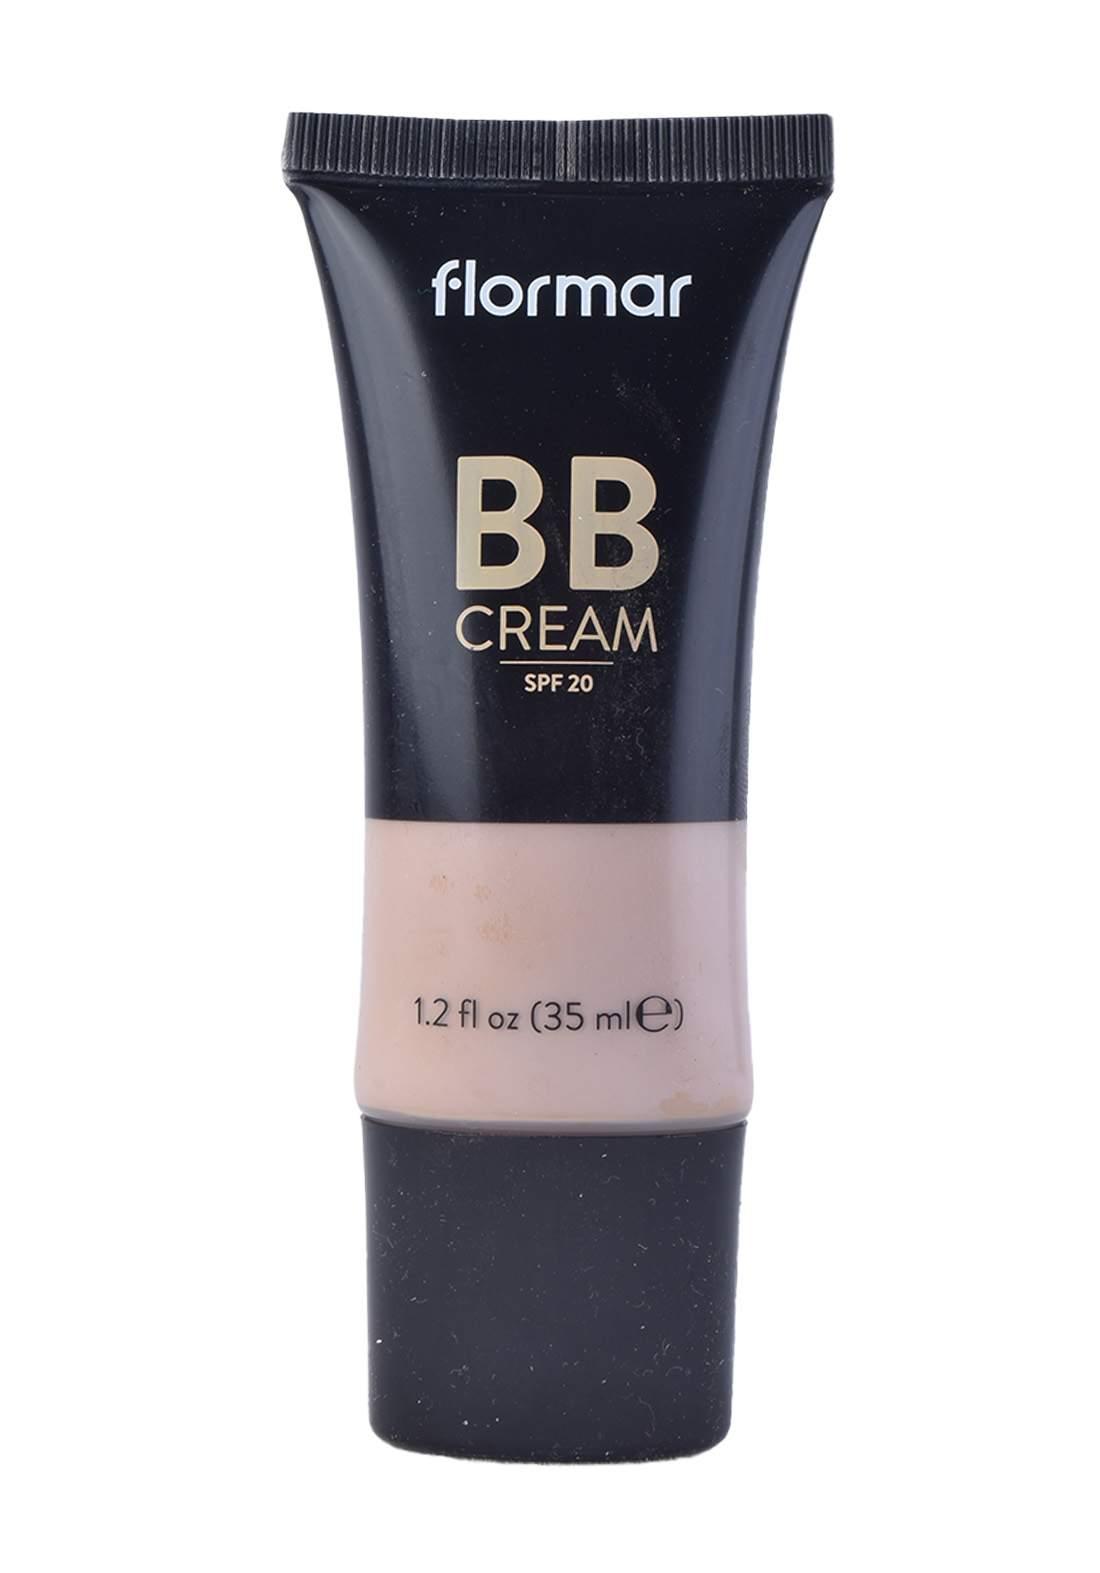 Flormar BB Cream SPF 20 Fair\Light 35ml بي بي كريم